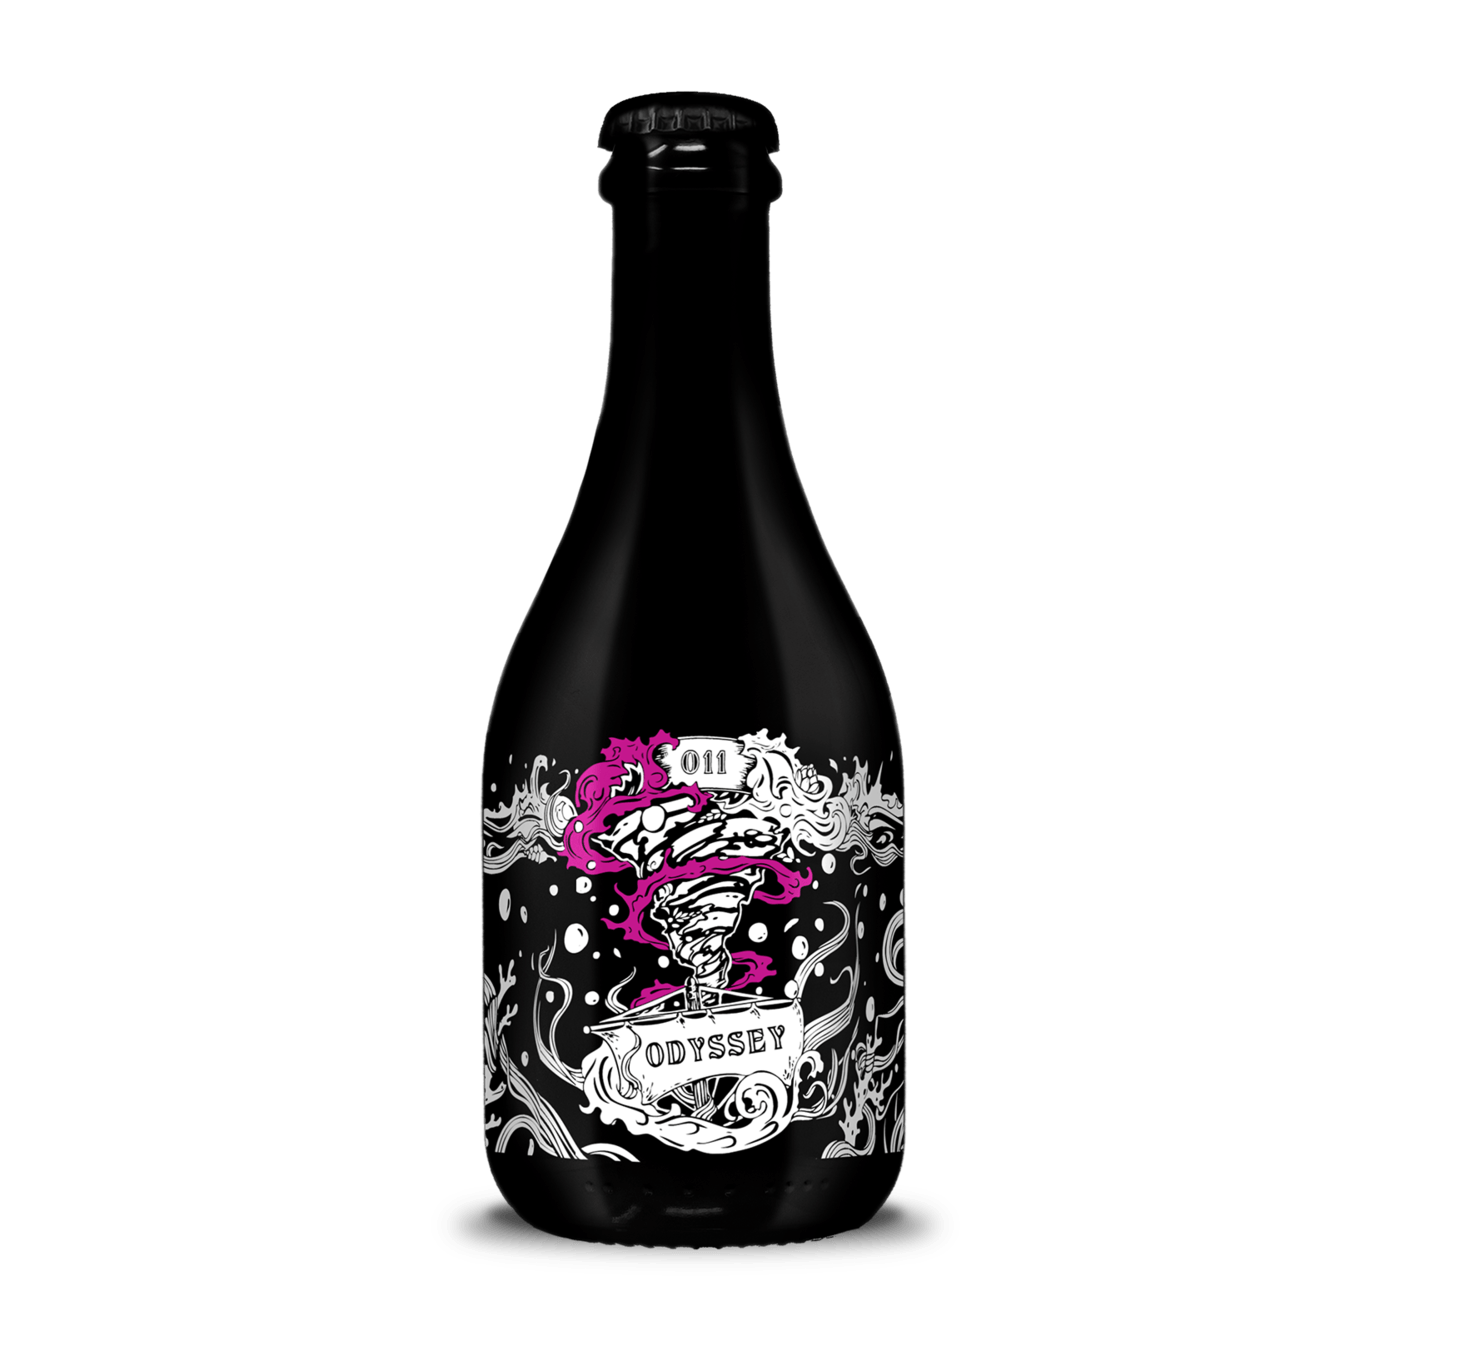 Siren | Odyssey 011 | Barrel Aged Imperial Stout Blend 11.5% 375ml